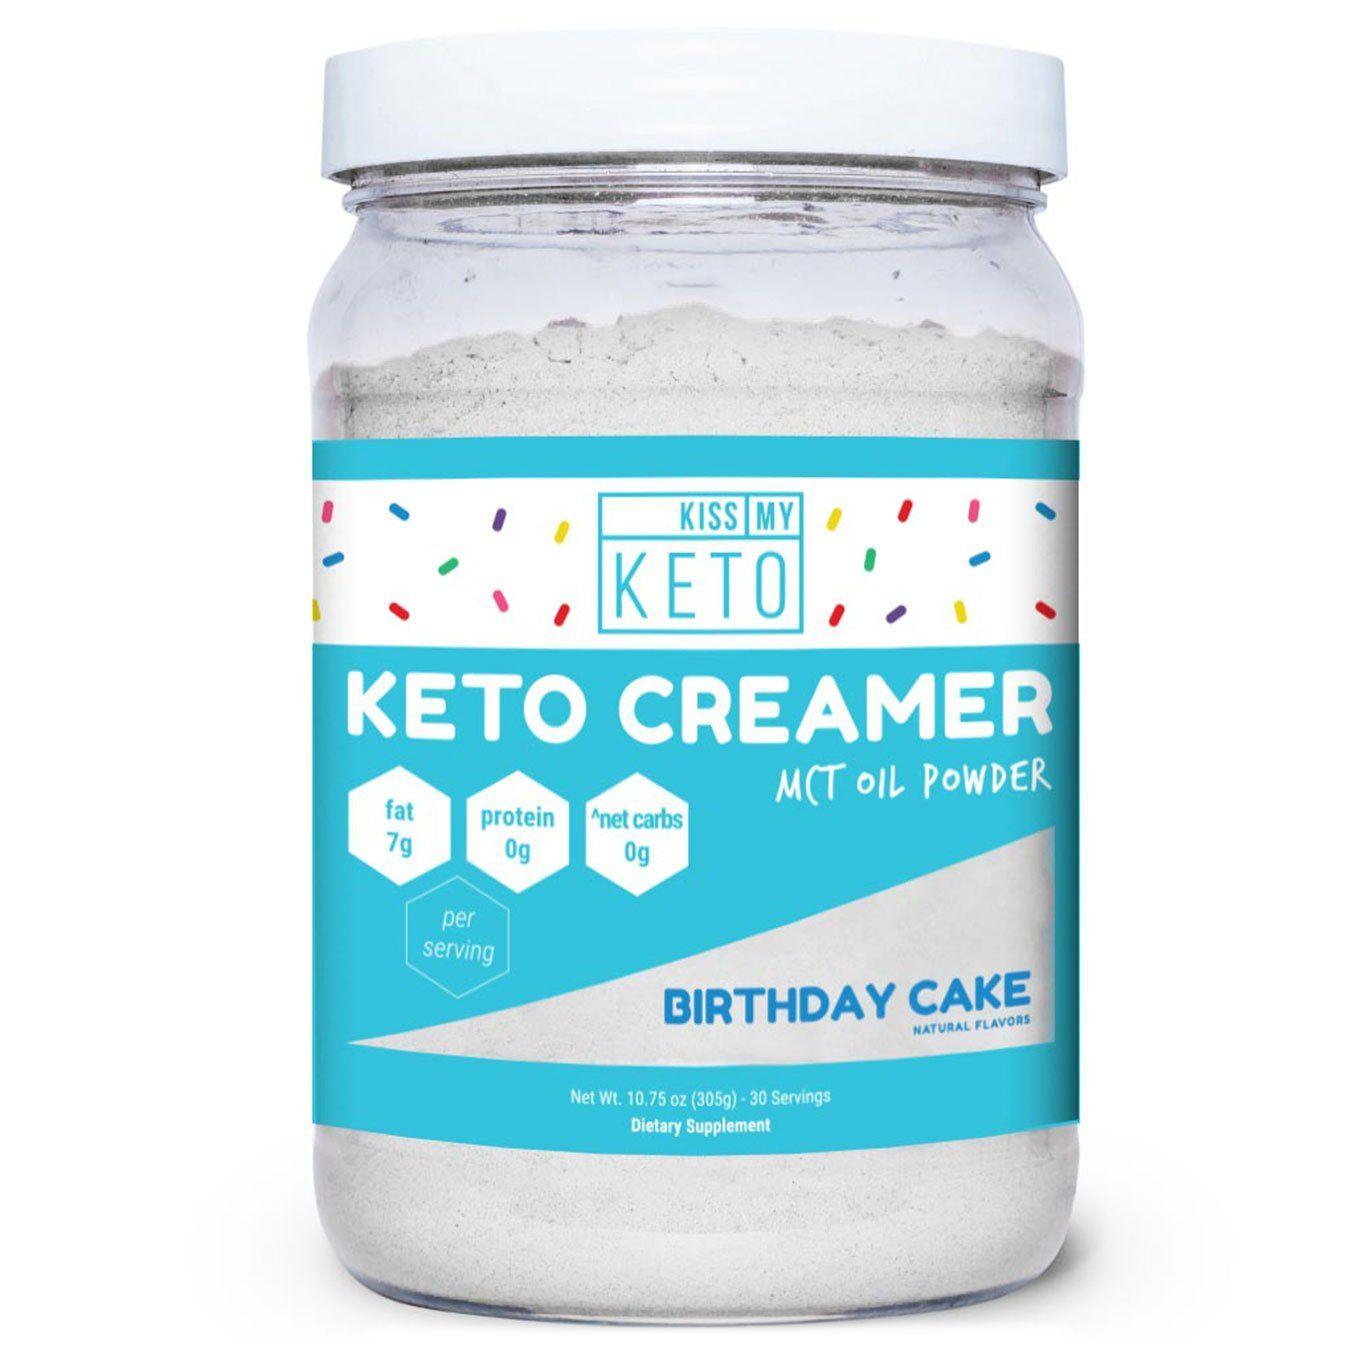 Keto creamer in 2020 keto coffee creamer keto mct oil